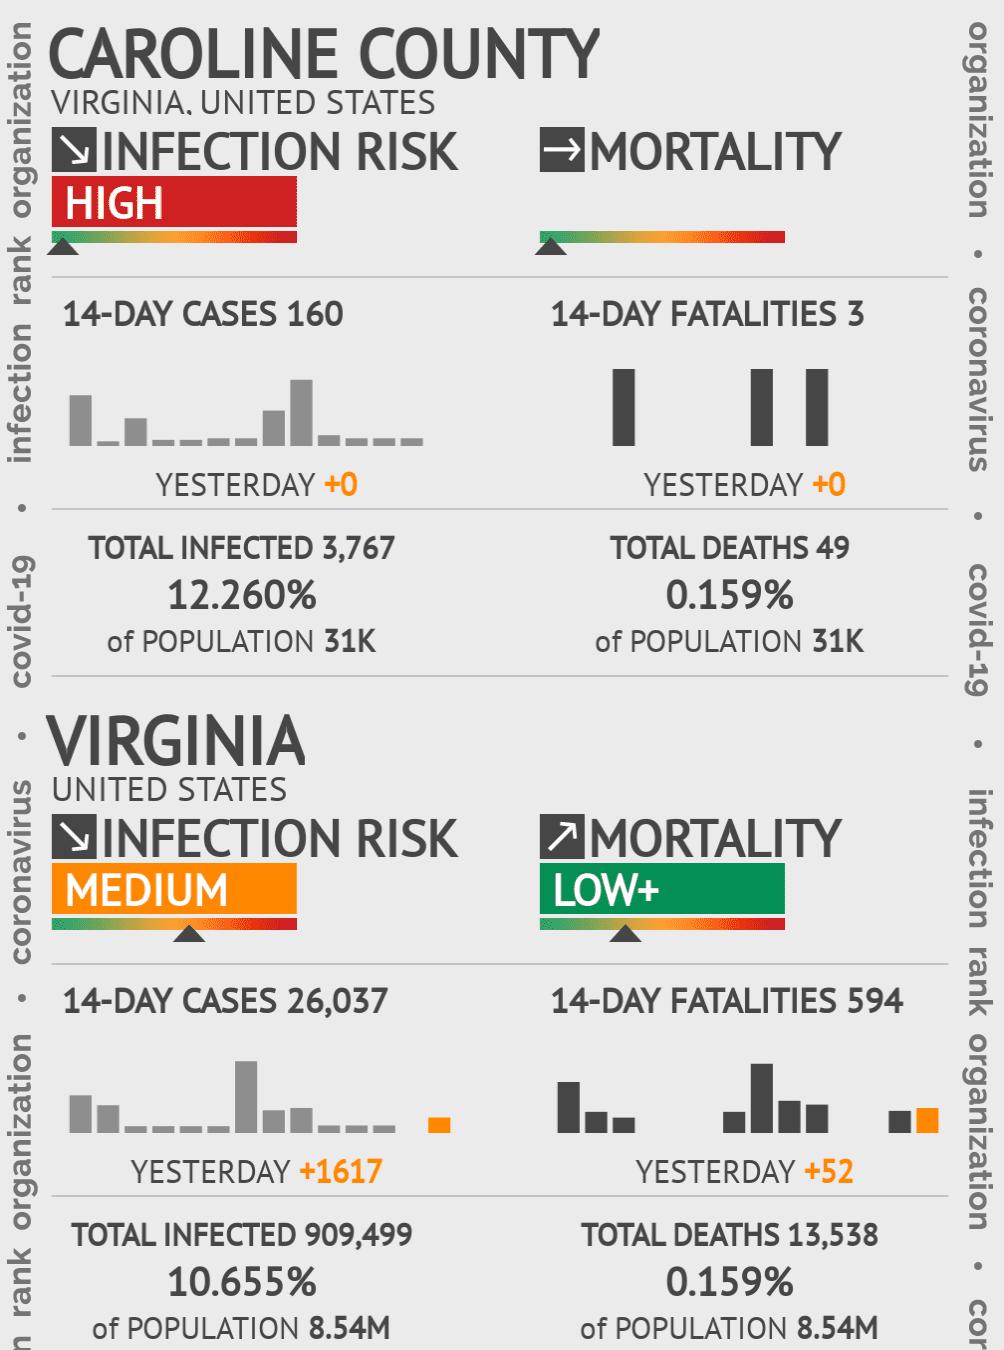 Caroline County Coronavirus Covid-19 Risk of Infection on July 24, 2021